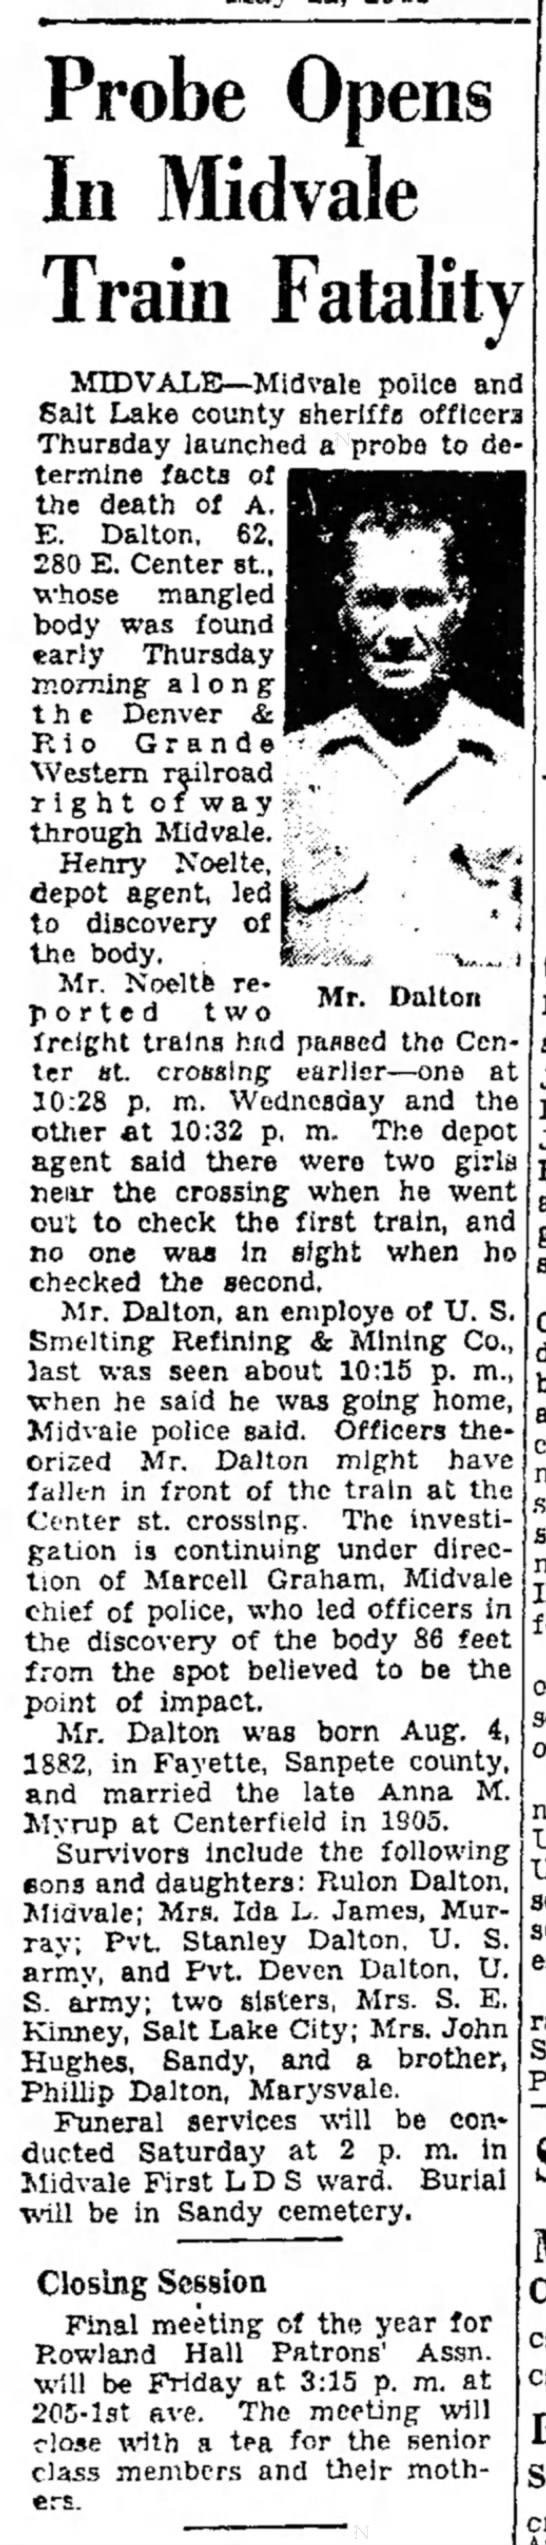 Train fatality 5-1145 -